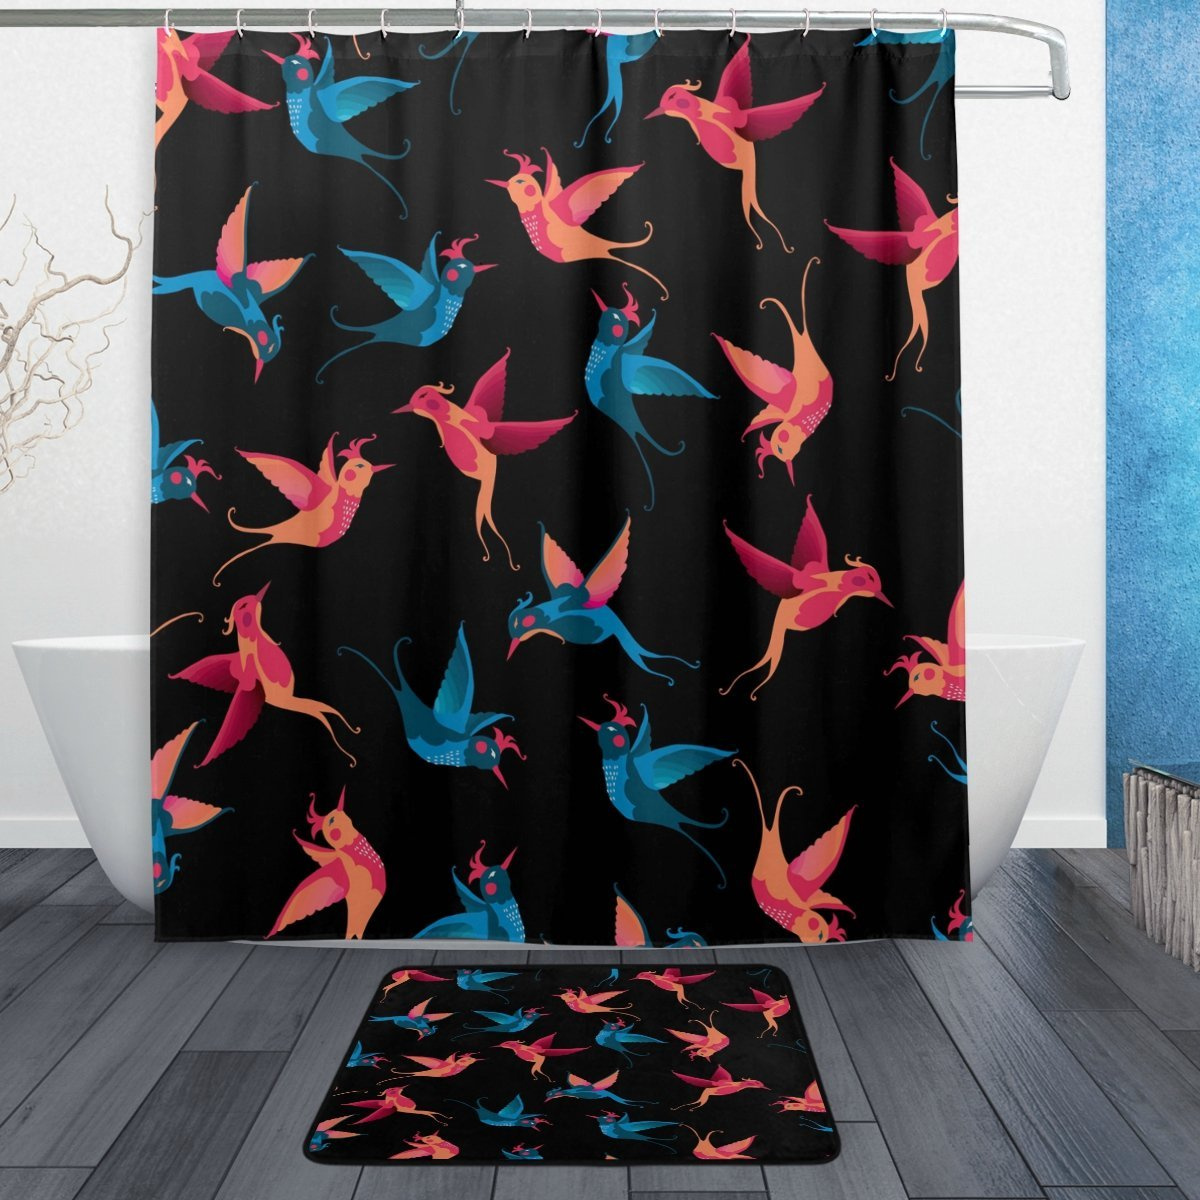 Colorful Bird Waterproof Polyester Fabric Shower Curtain with Hooks Doormat Bath Floor Mat Bathroom Home Decor